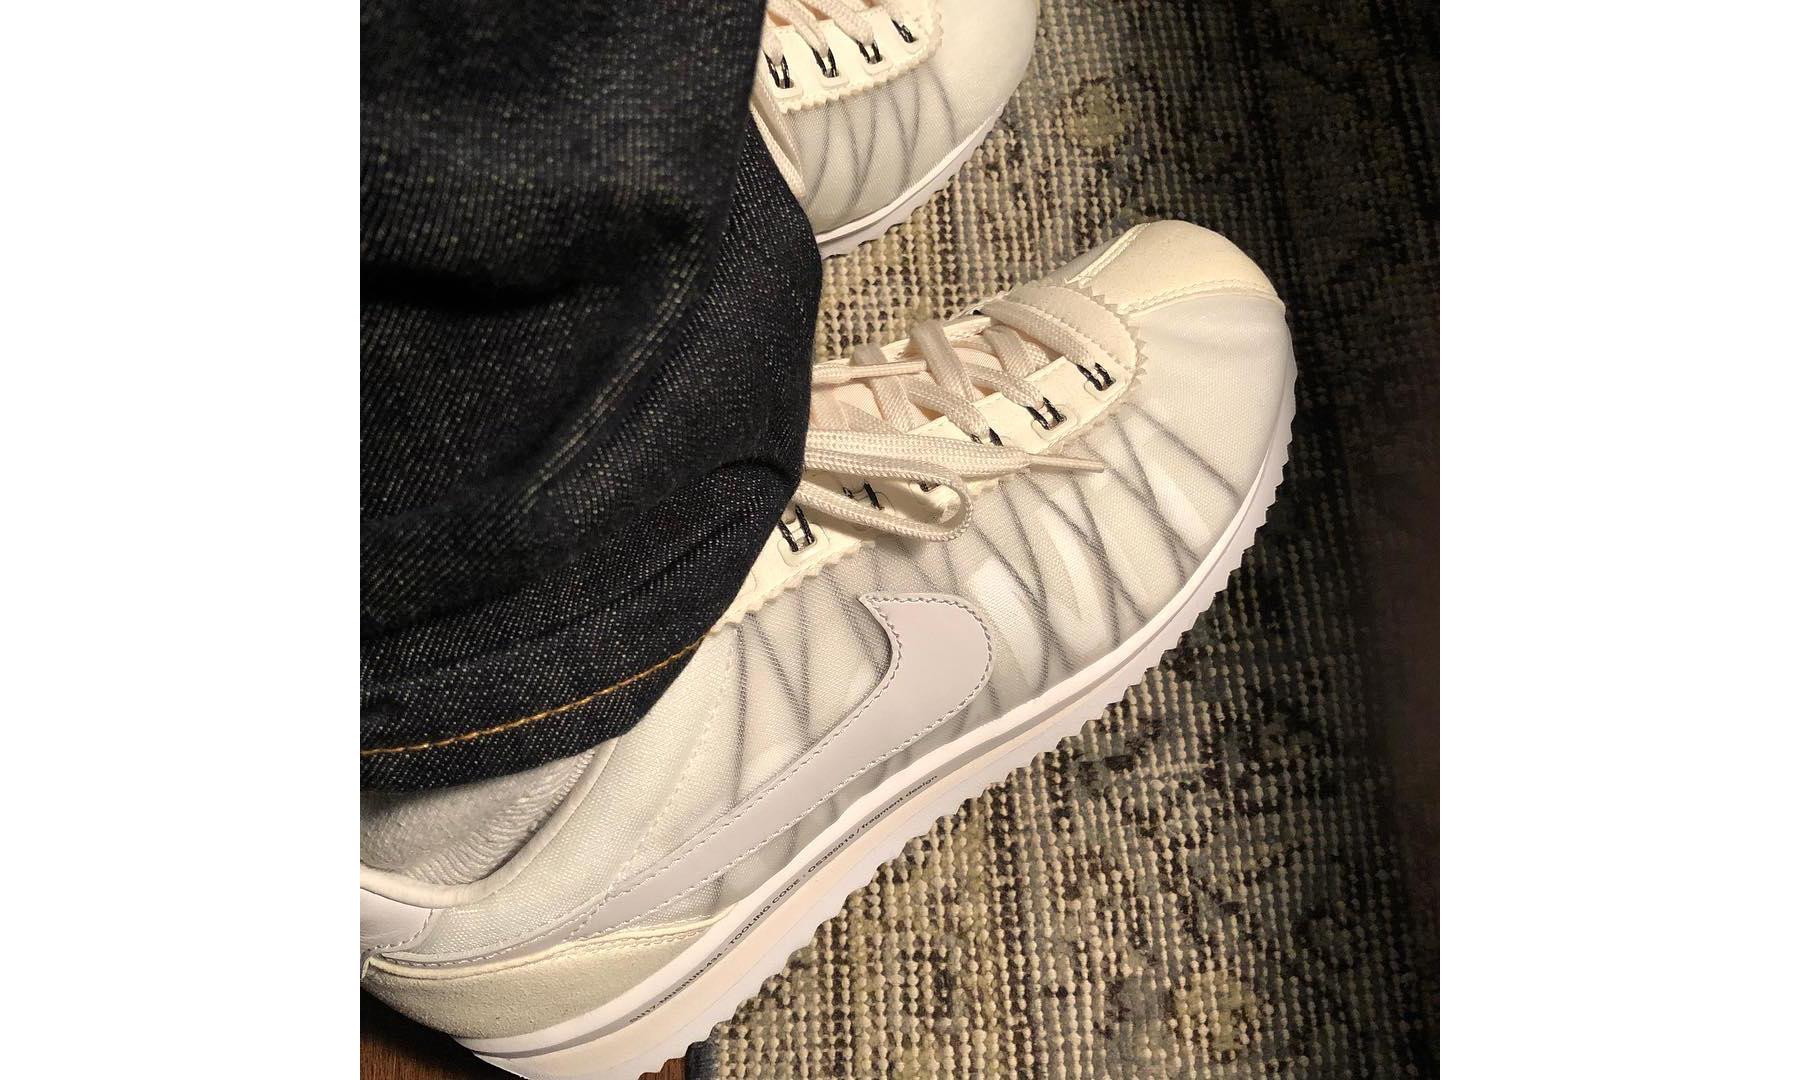 藤原浩曝光 fragment design x Nike Cortez 全新设计